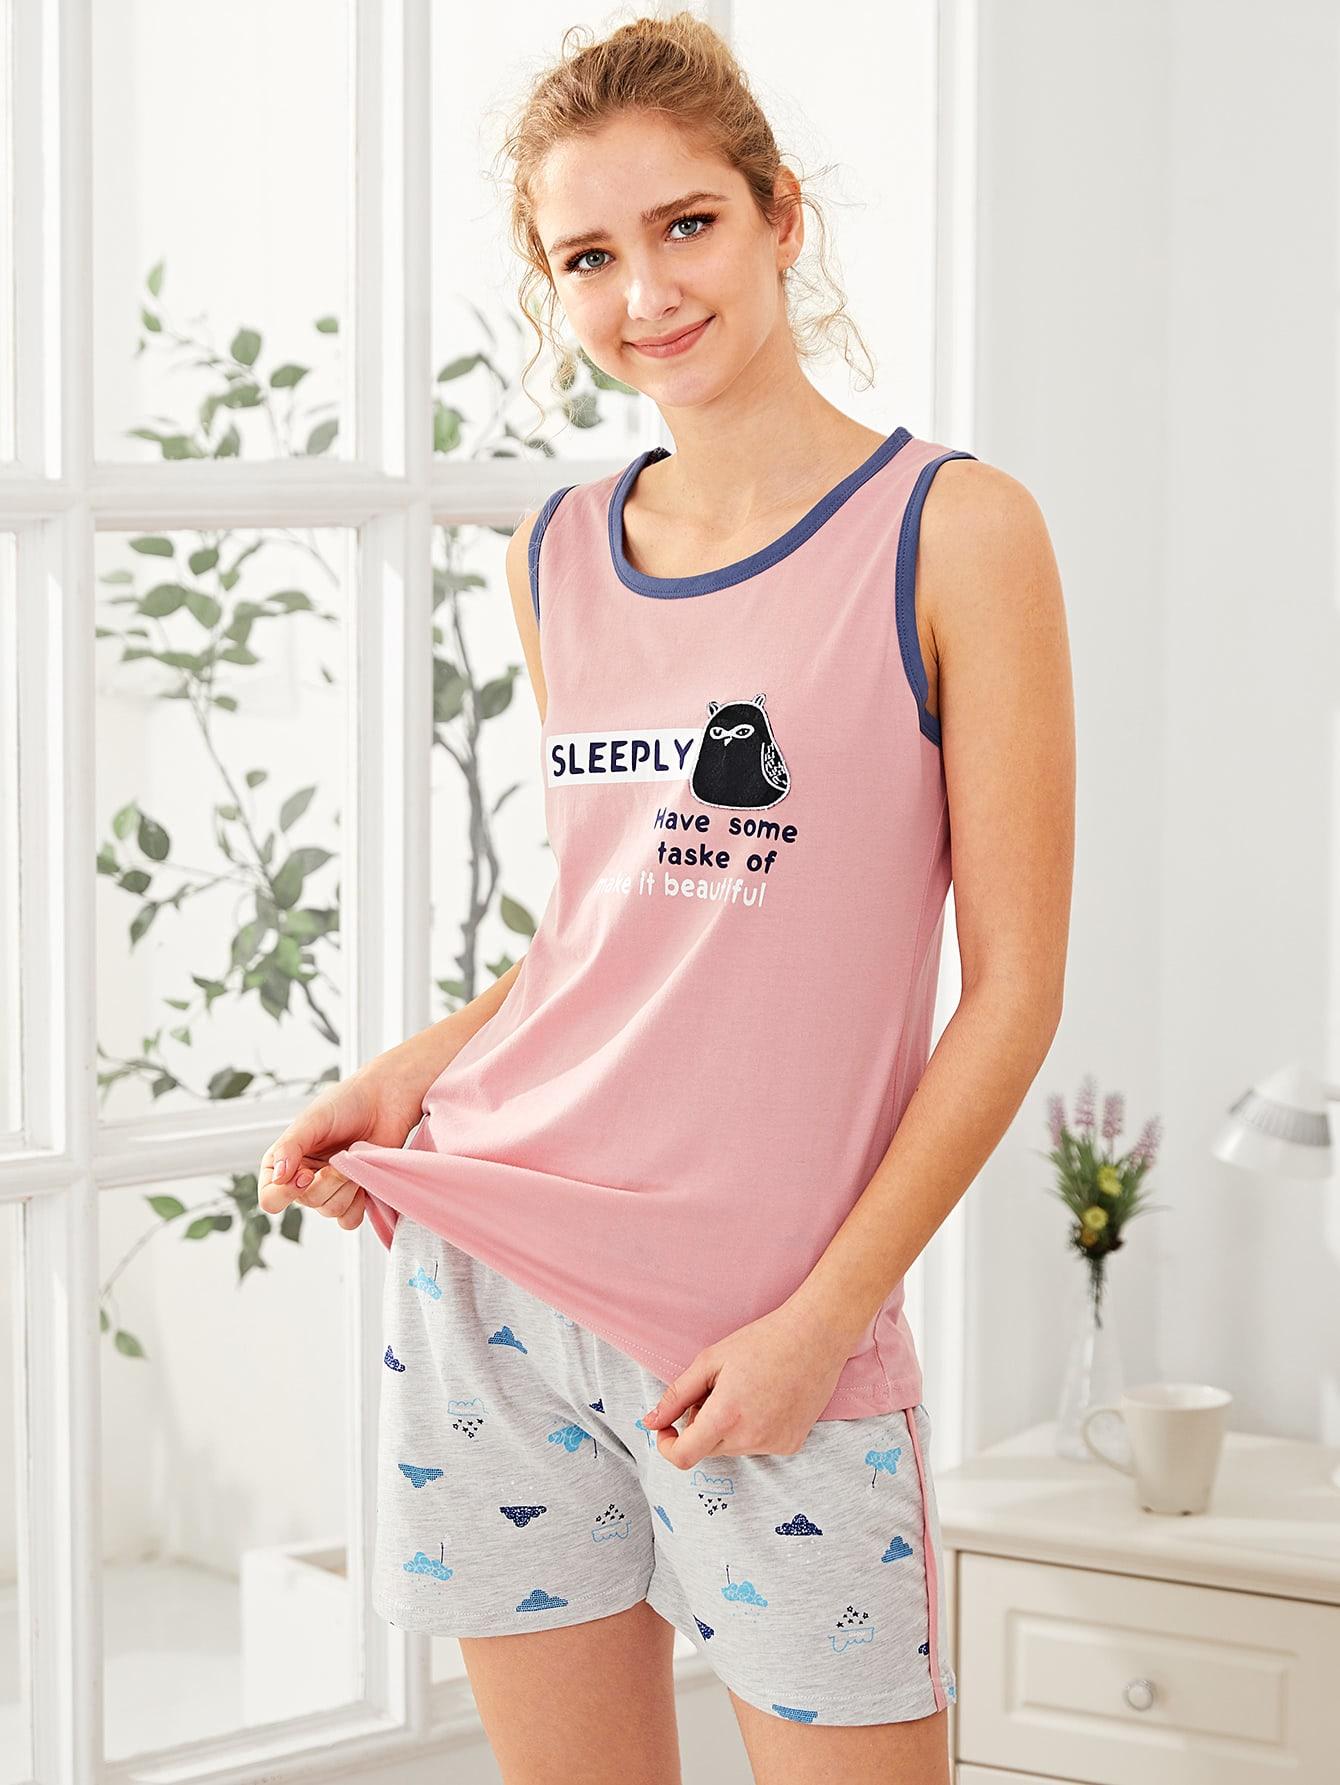 Cartoon Patch Tank Top & Shorts PJ Set rolled up sleeve top and leopard print shorts pj set